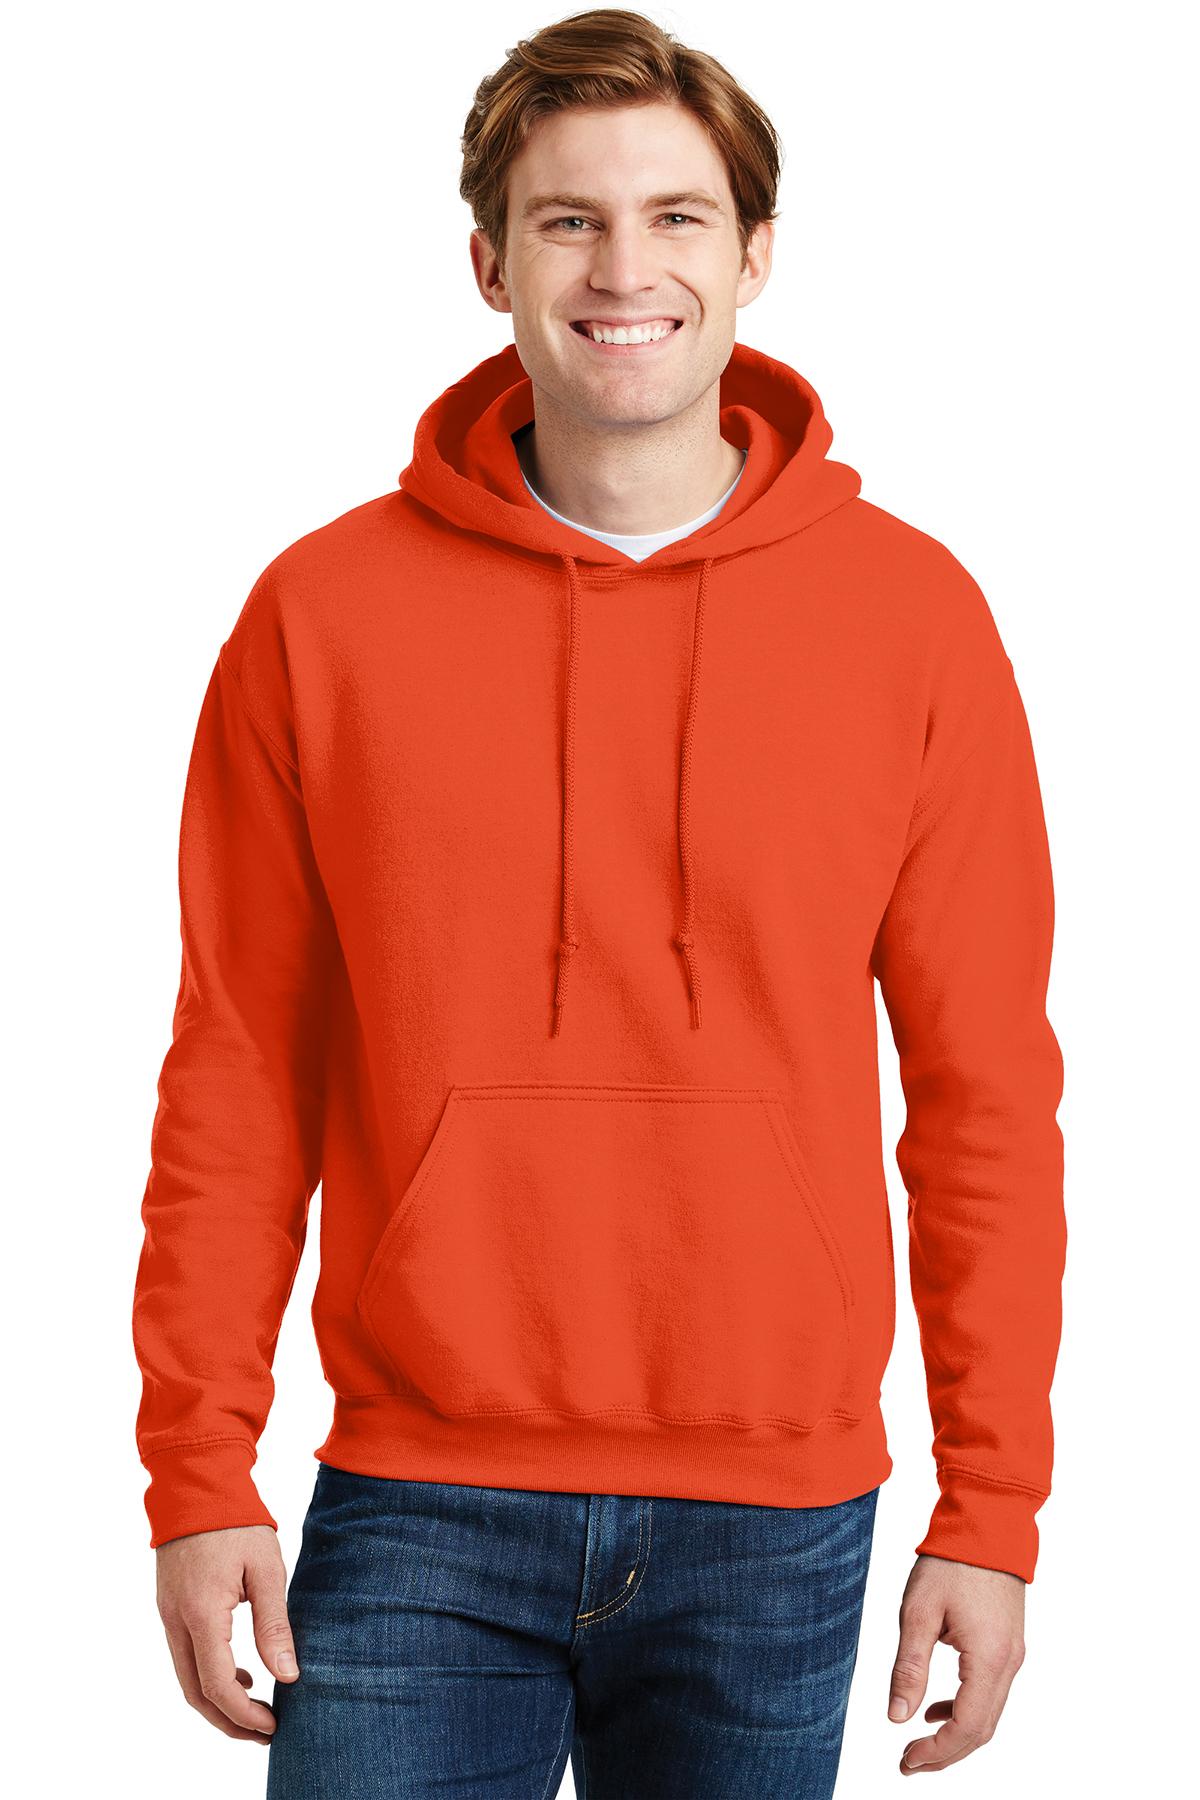 f9c30beb1644 Gildan® - DryBlend® Pullover Hooded Sweatshirt